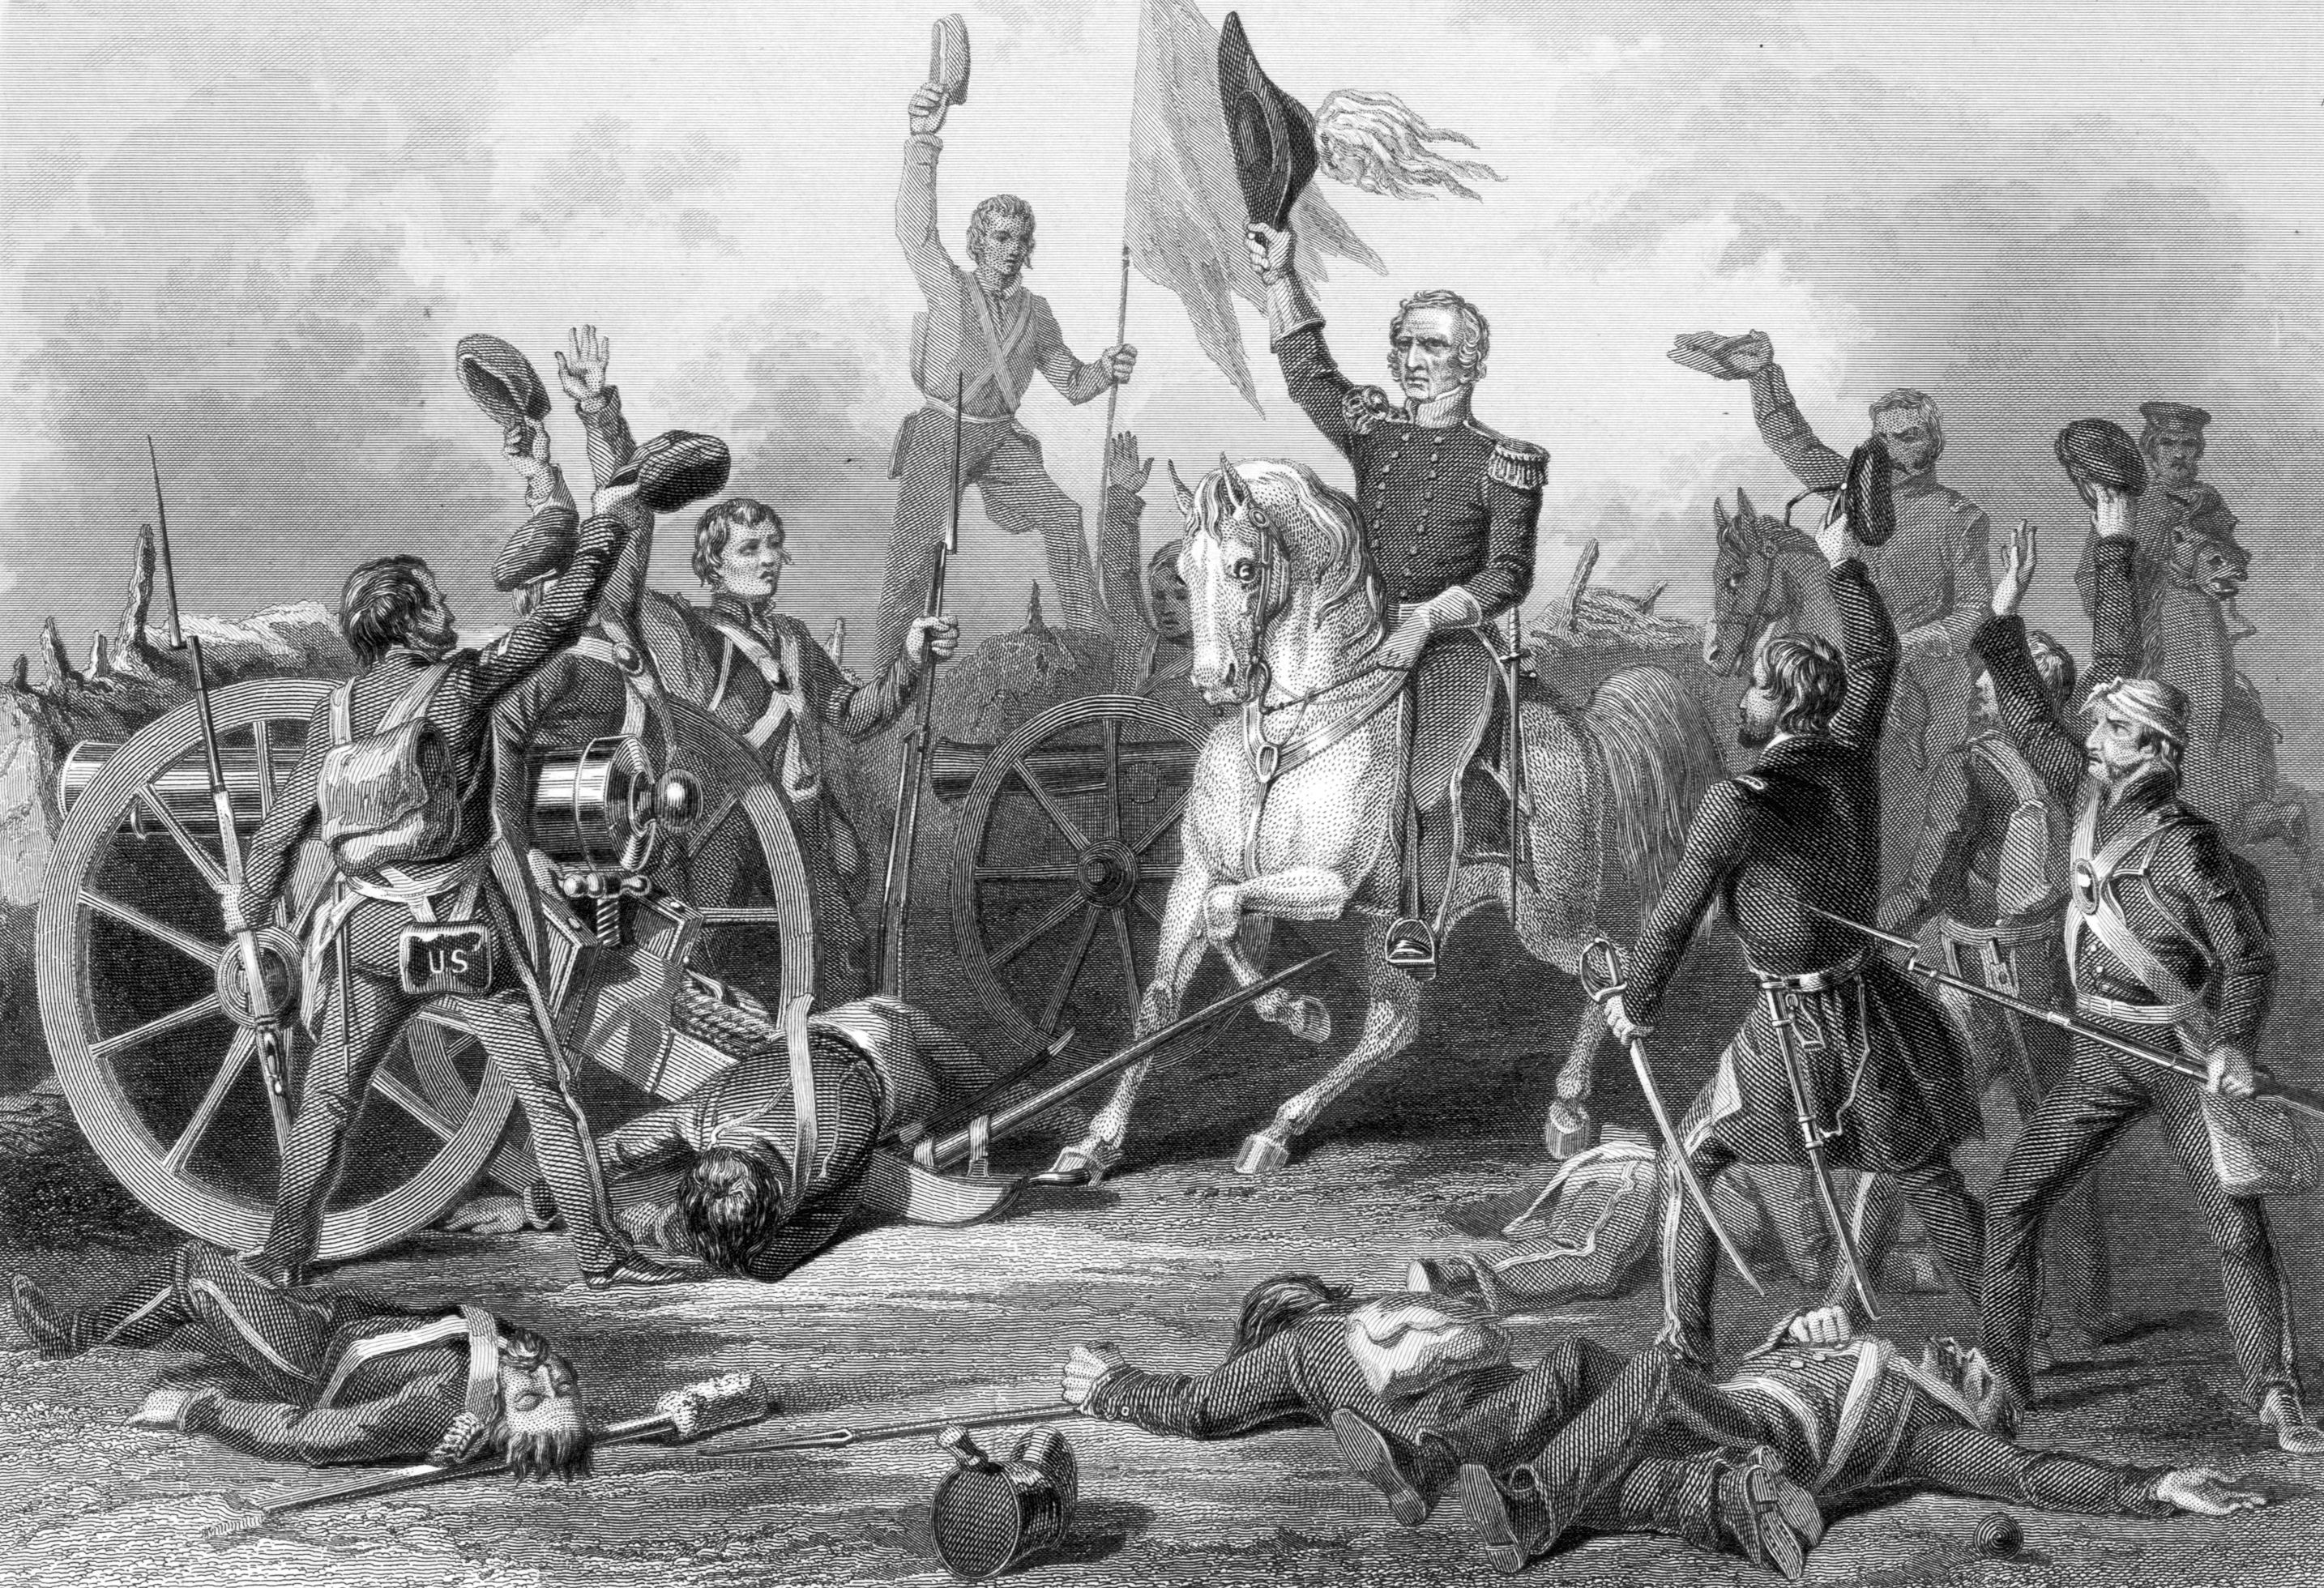 The Battle of Contreras